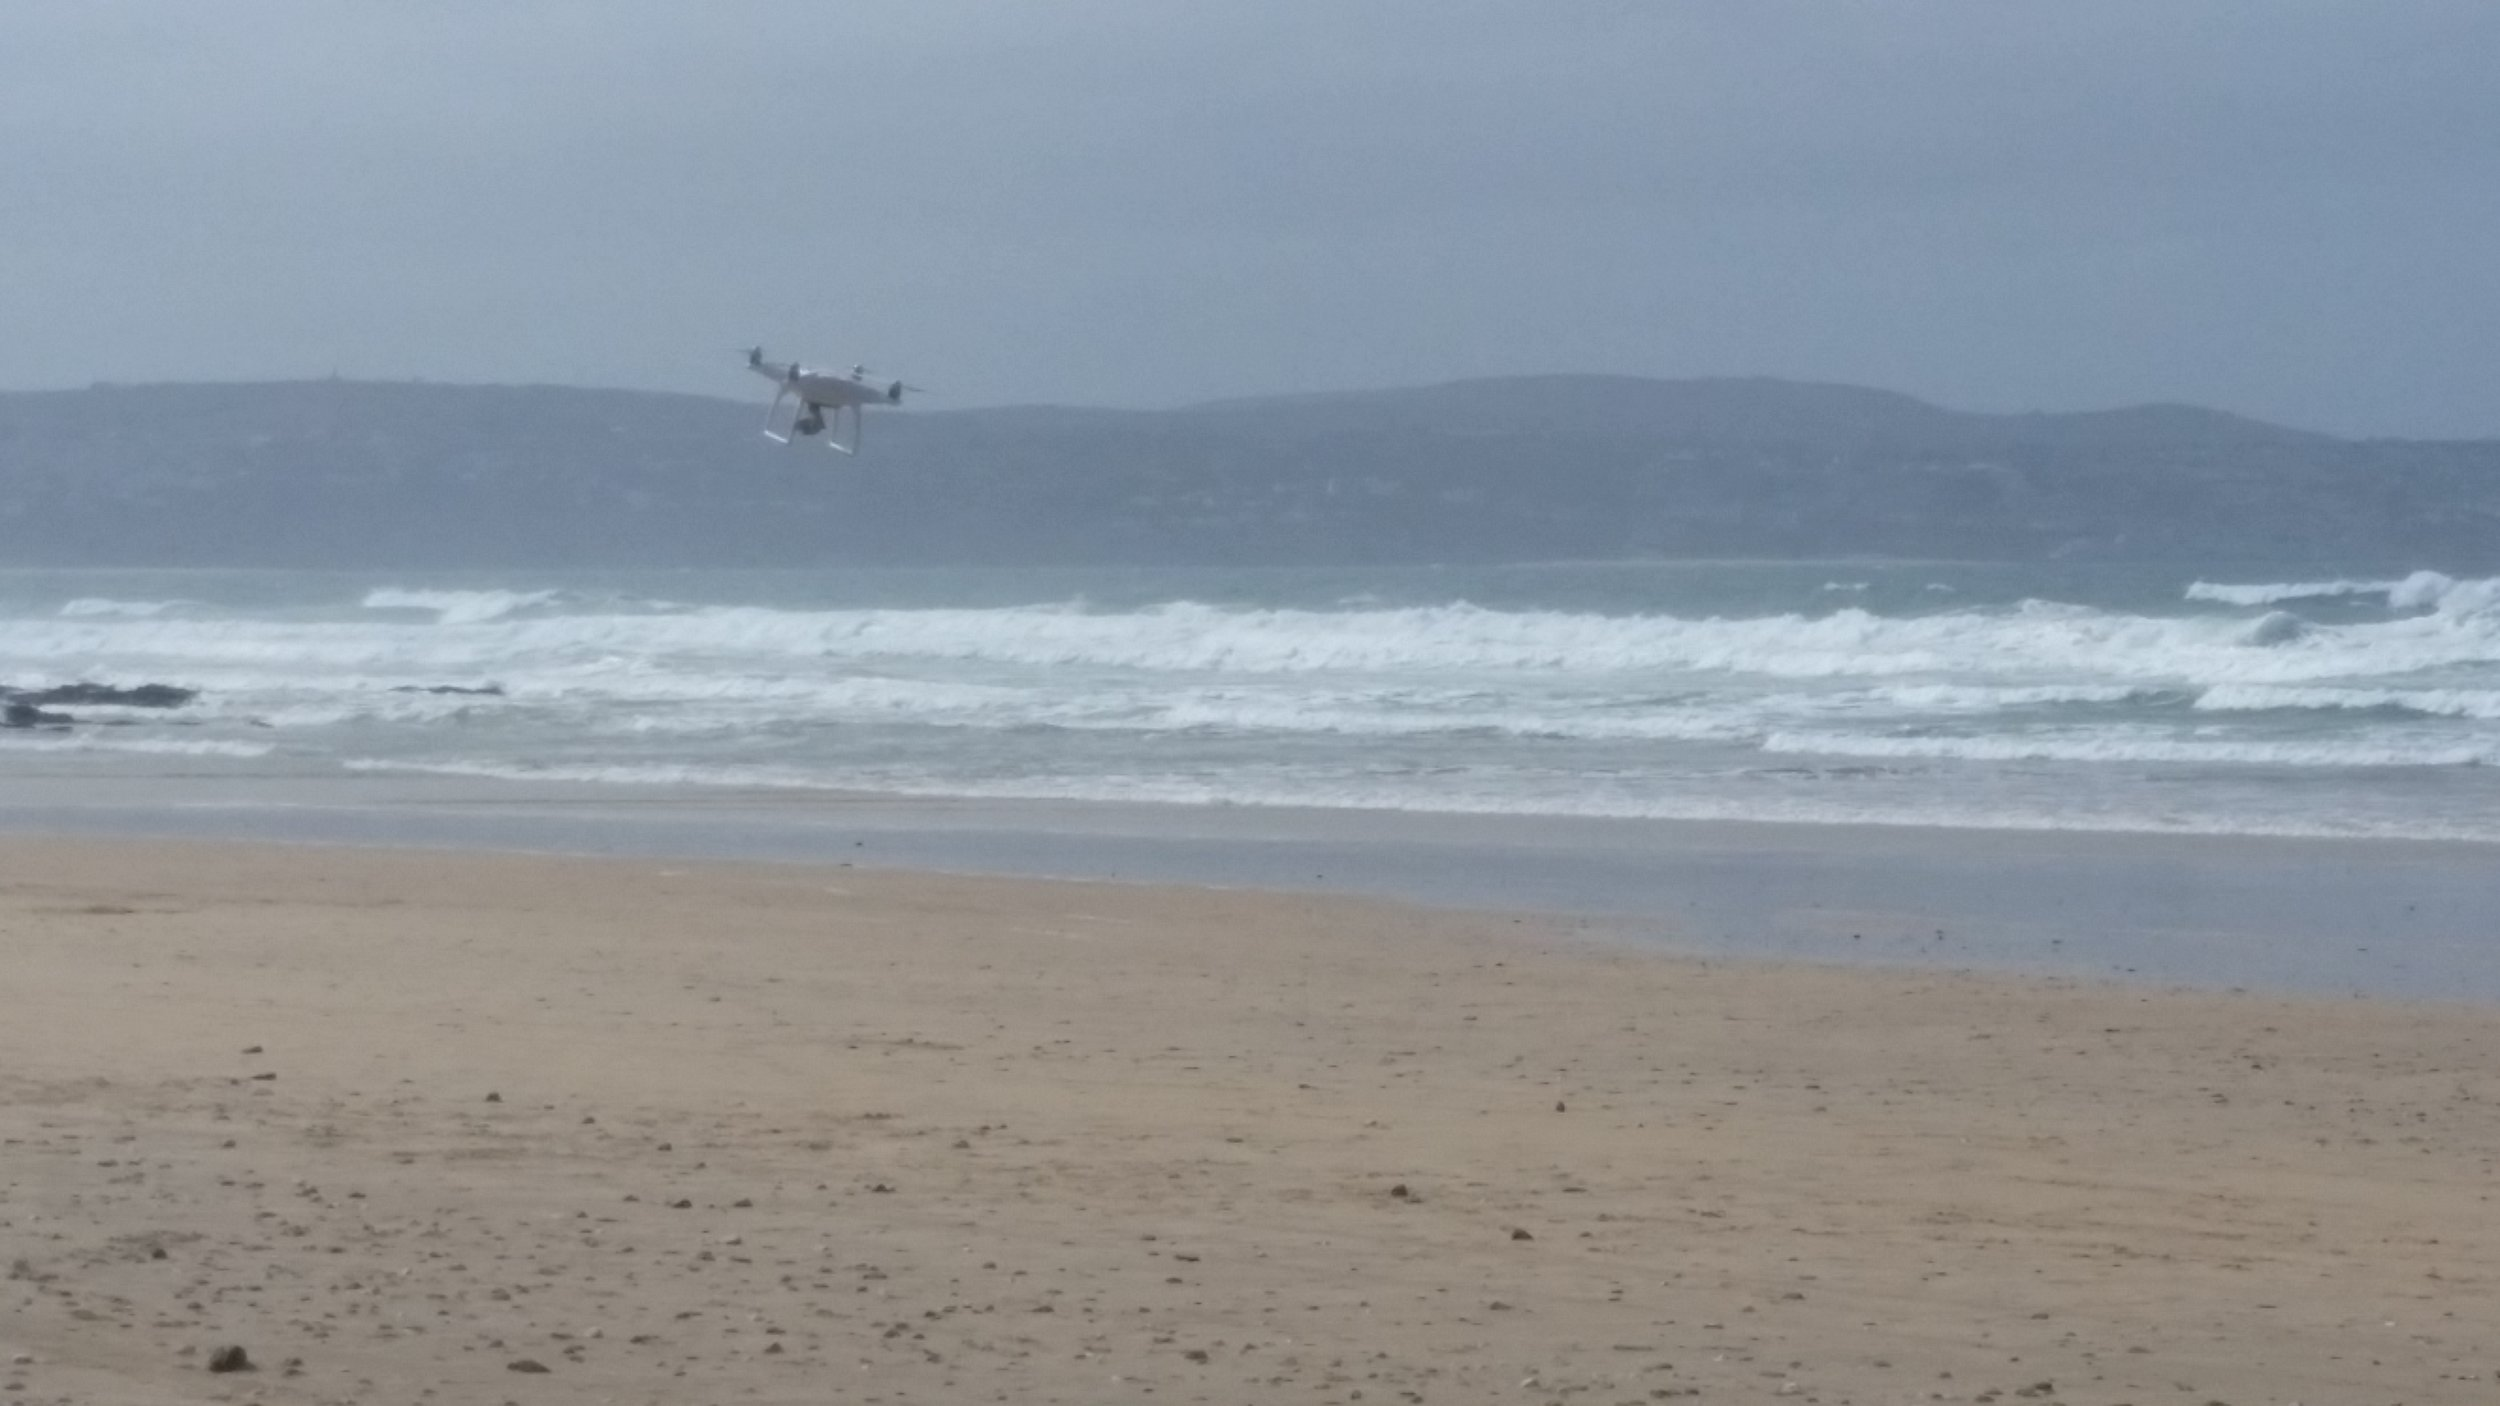 Our DJI Phantom 4 survey drone fighting a strong headwind.